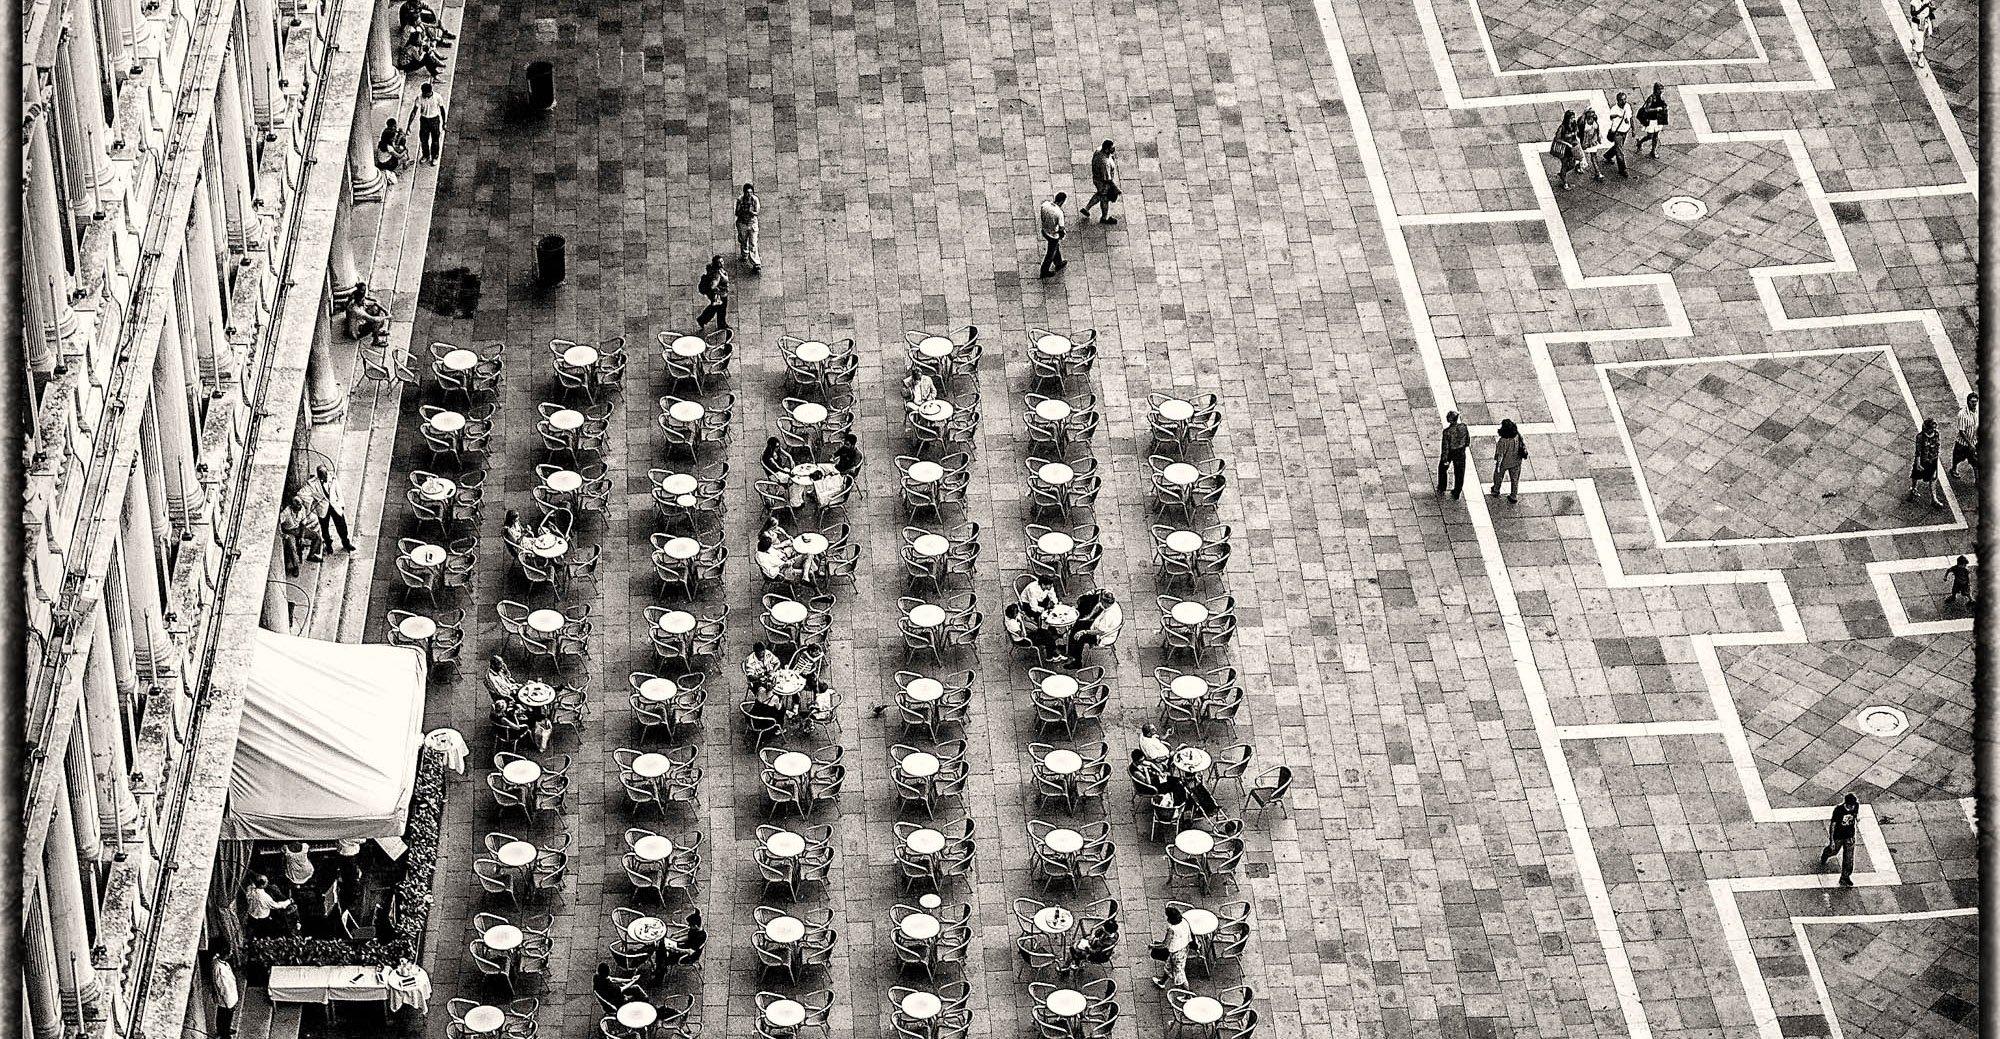 Fotografo Profesional Málaga, Fotografo Málaga, Fotografo Granada, Fotografo, Fotografo, Marbella, Fotografo Torremolinos, Fotografo Benalmádena, Fotografo Fuengirola, Fotografo Frigiliana, Fotografo Torre del Mar, Fotografo Rincón de la Victoria, Fotografo Torrox, Fotografo Paisajes, Fotografo Profesional Hoteles, Fotografo Profesional Inmobiliaria, Fotografo Interiorismo, Fotografo Arquitectura, Fotografo Decoración, Fotografia Decorativa, Fotografo Turismo, Fotografo Viajes